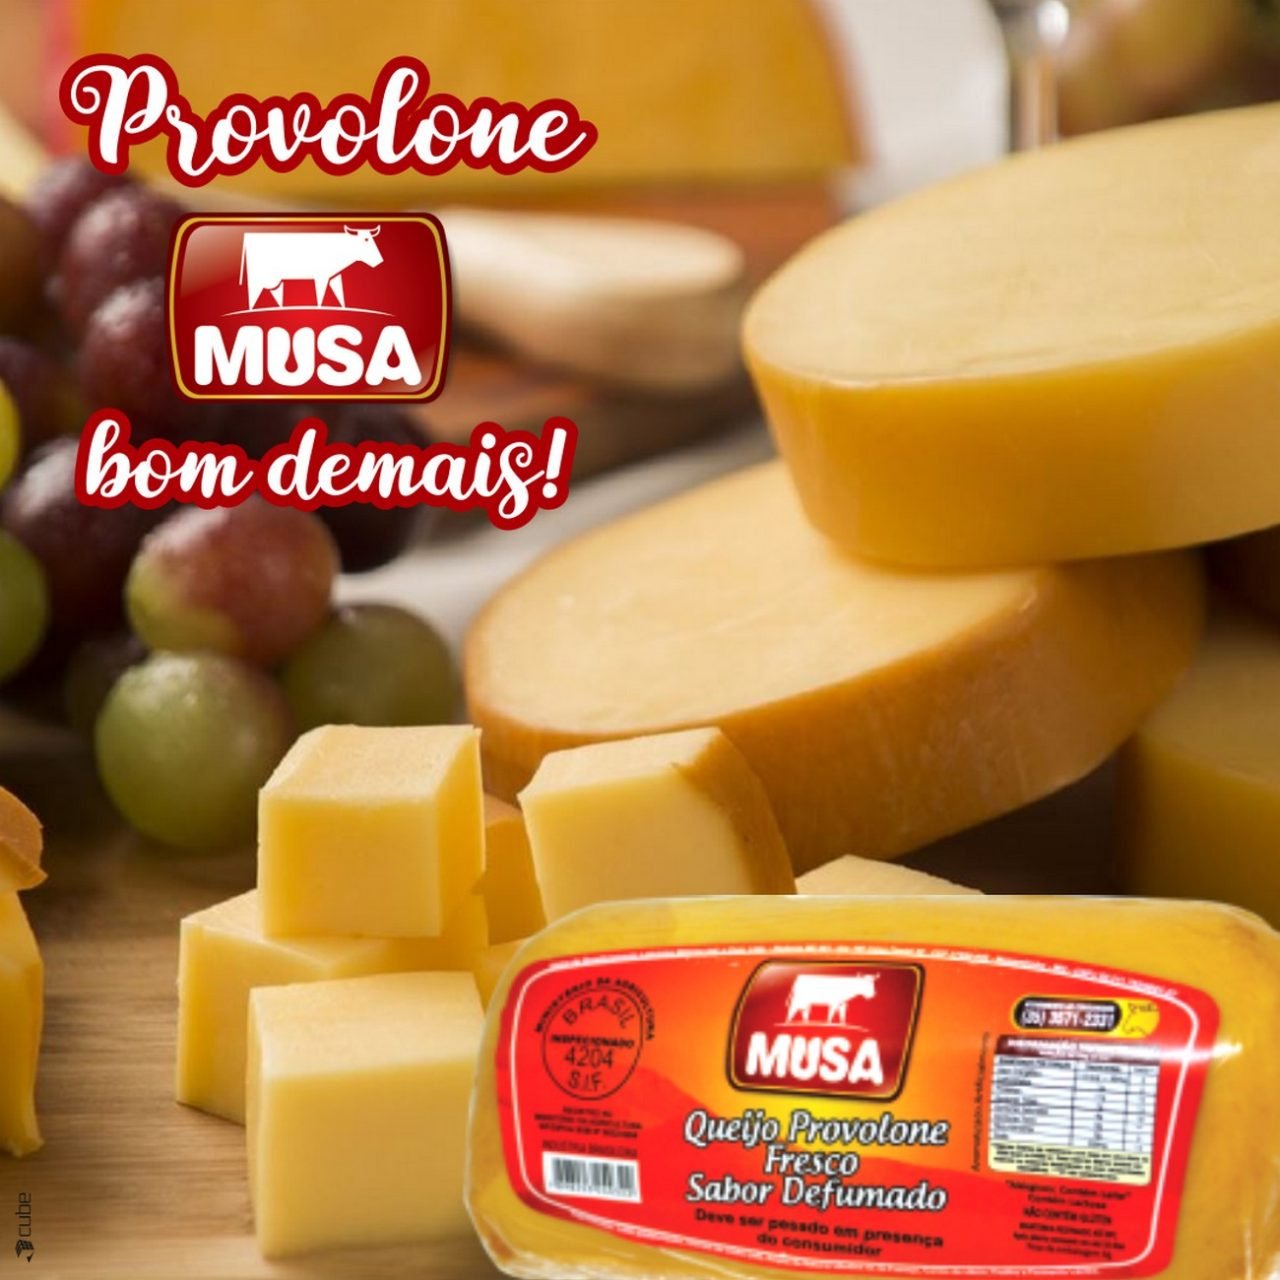 ProvoloneMusa0410